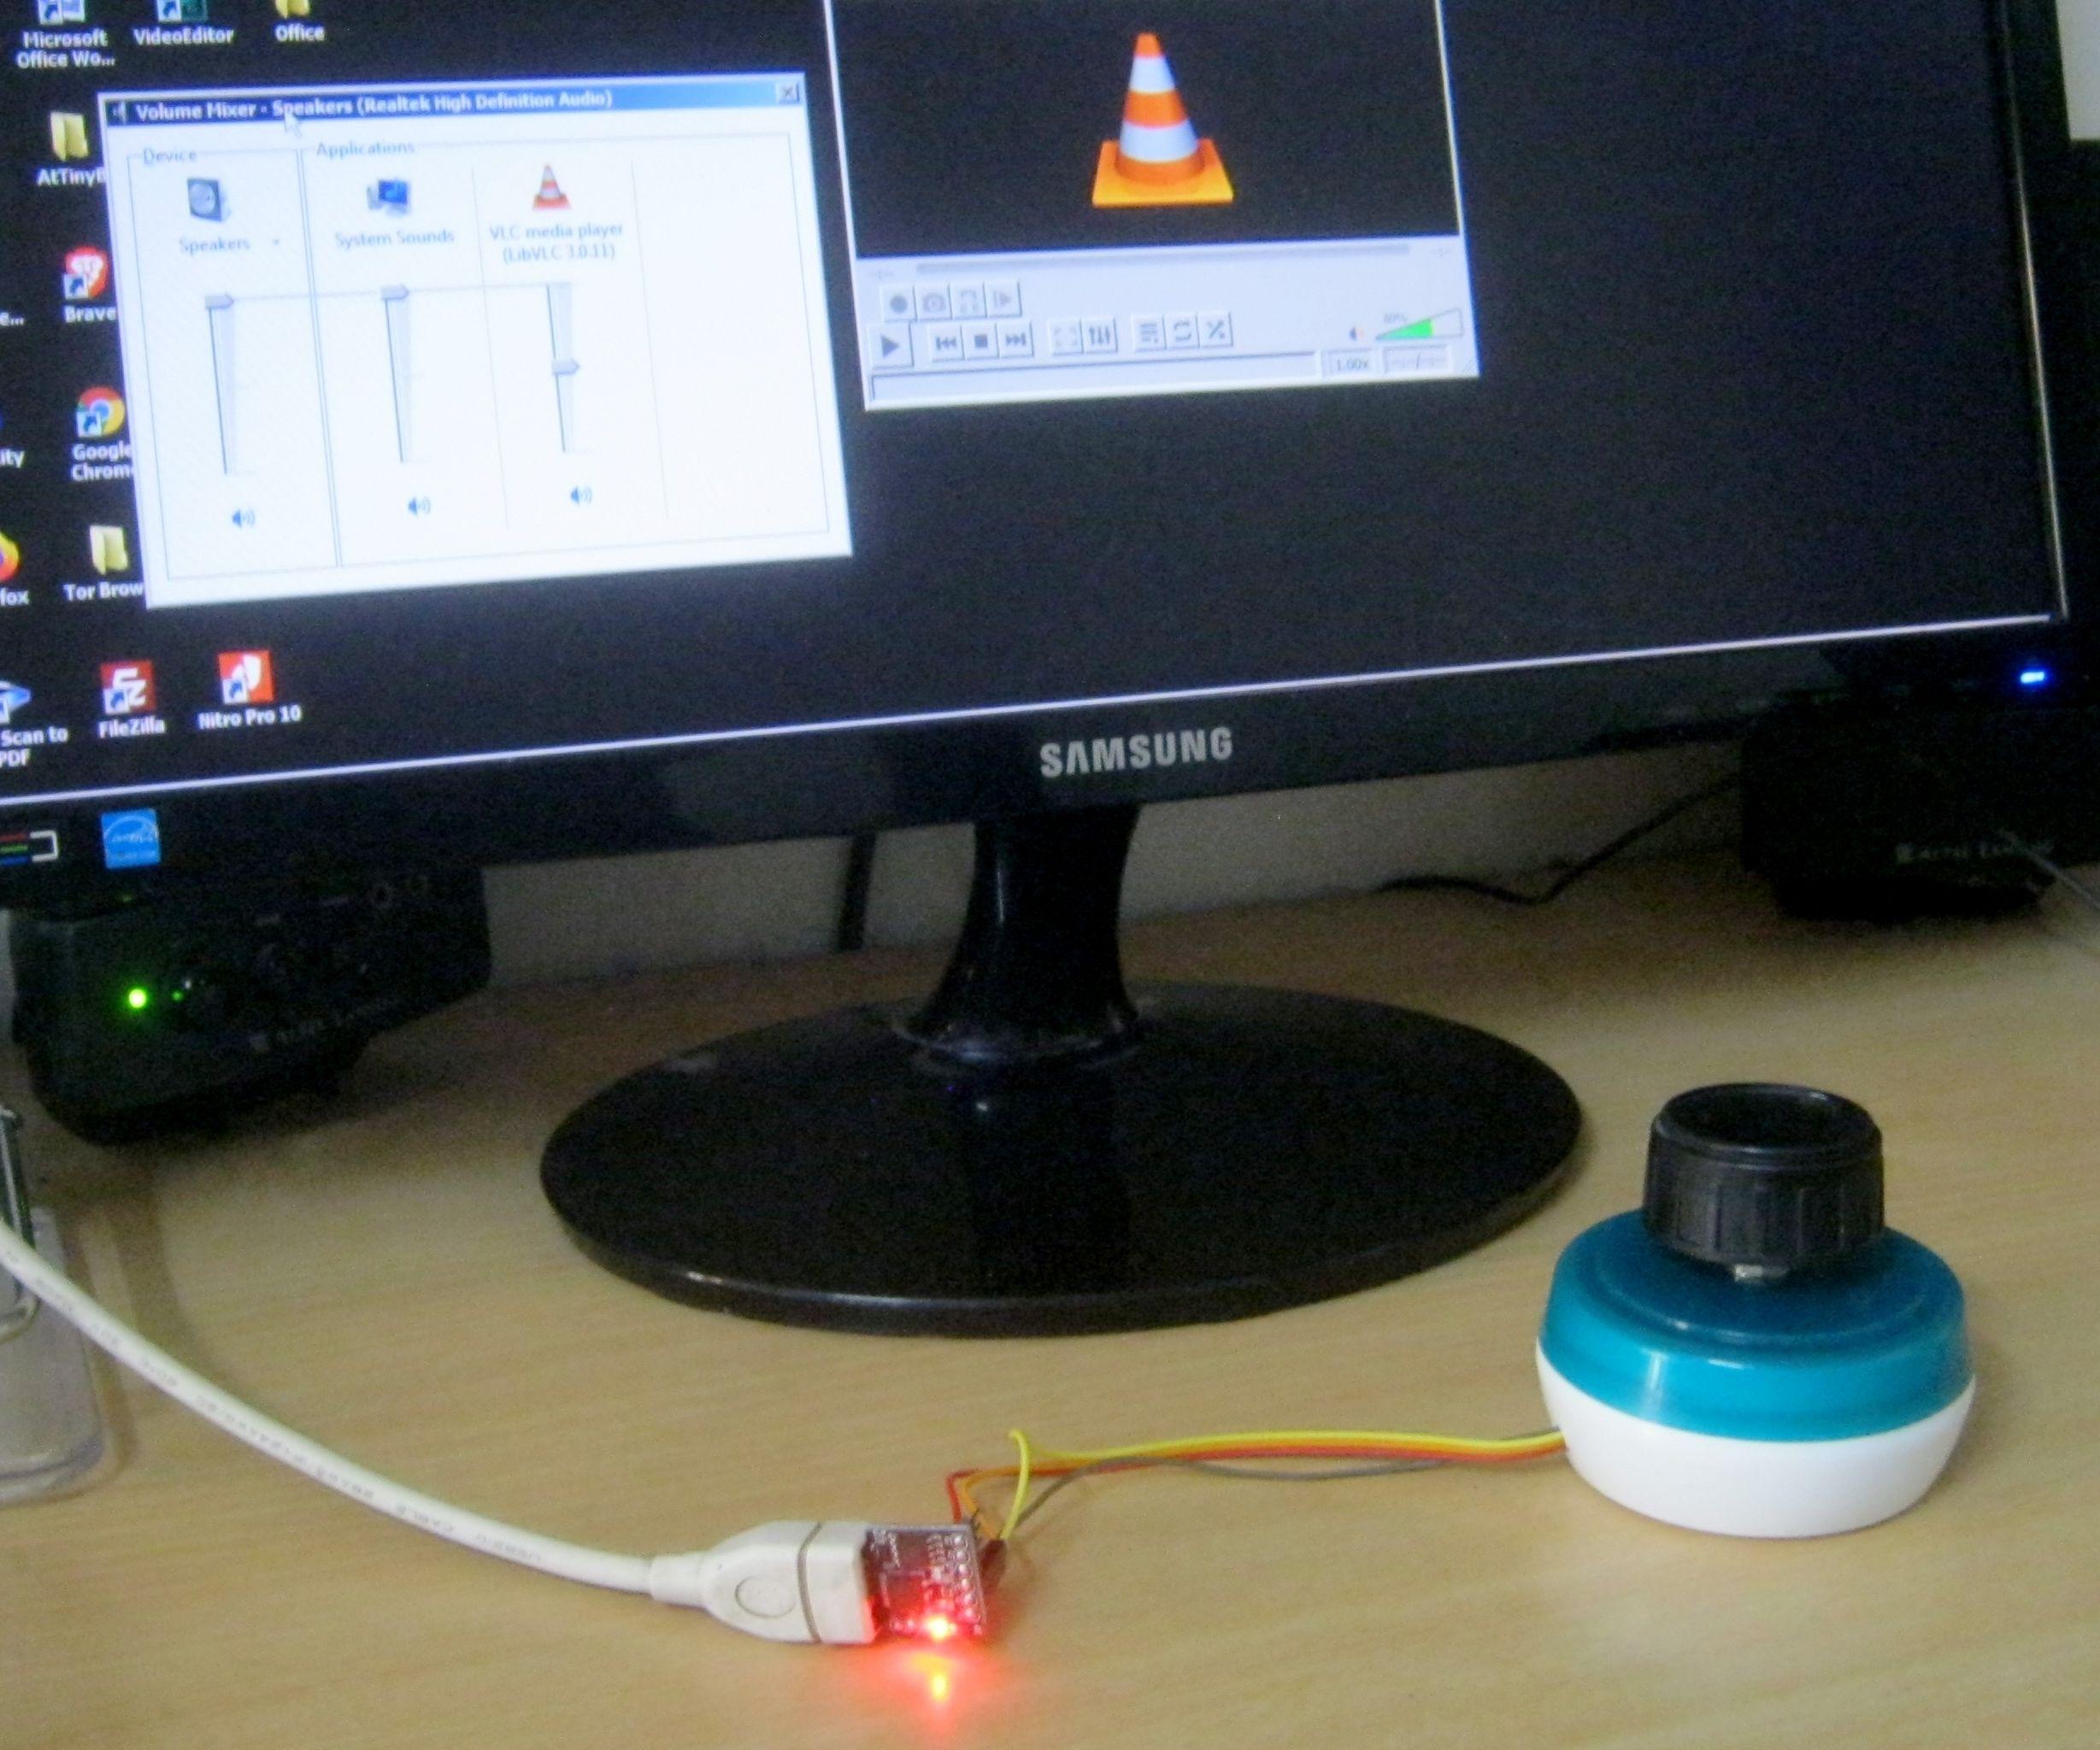 USB Volume Knob Using DigiSpark and Rotary Encoder